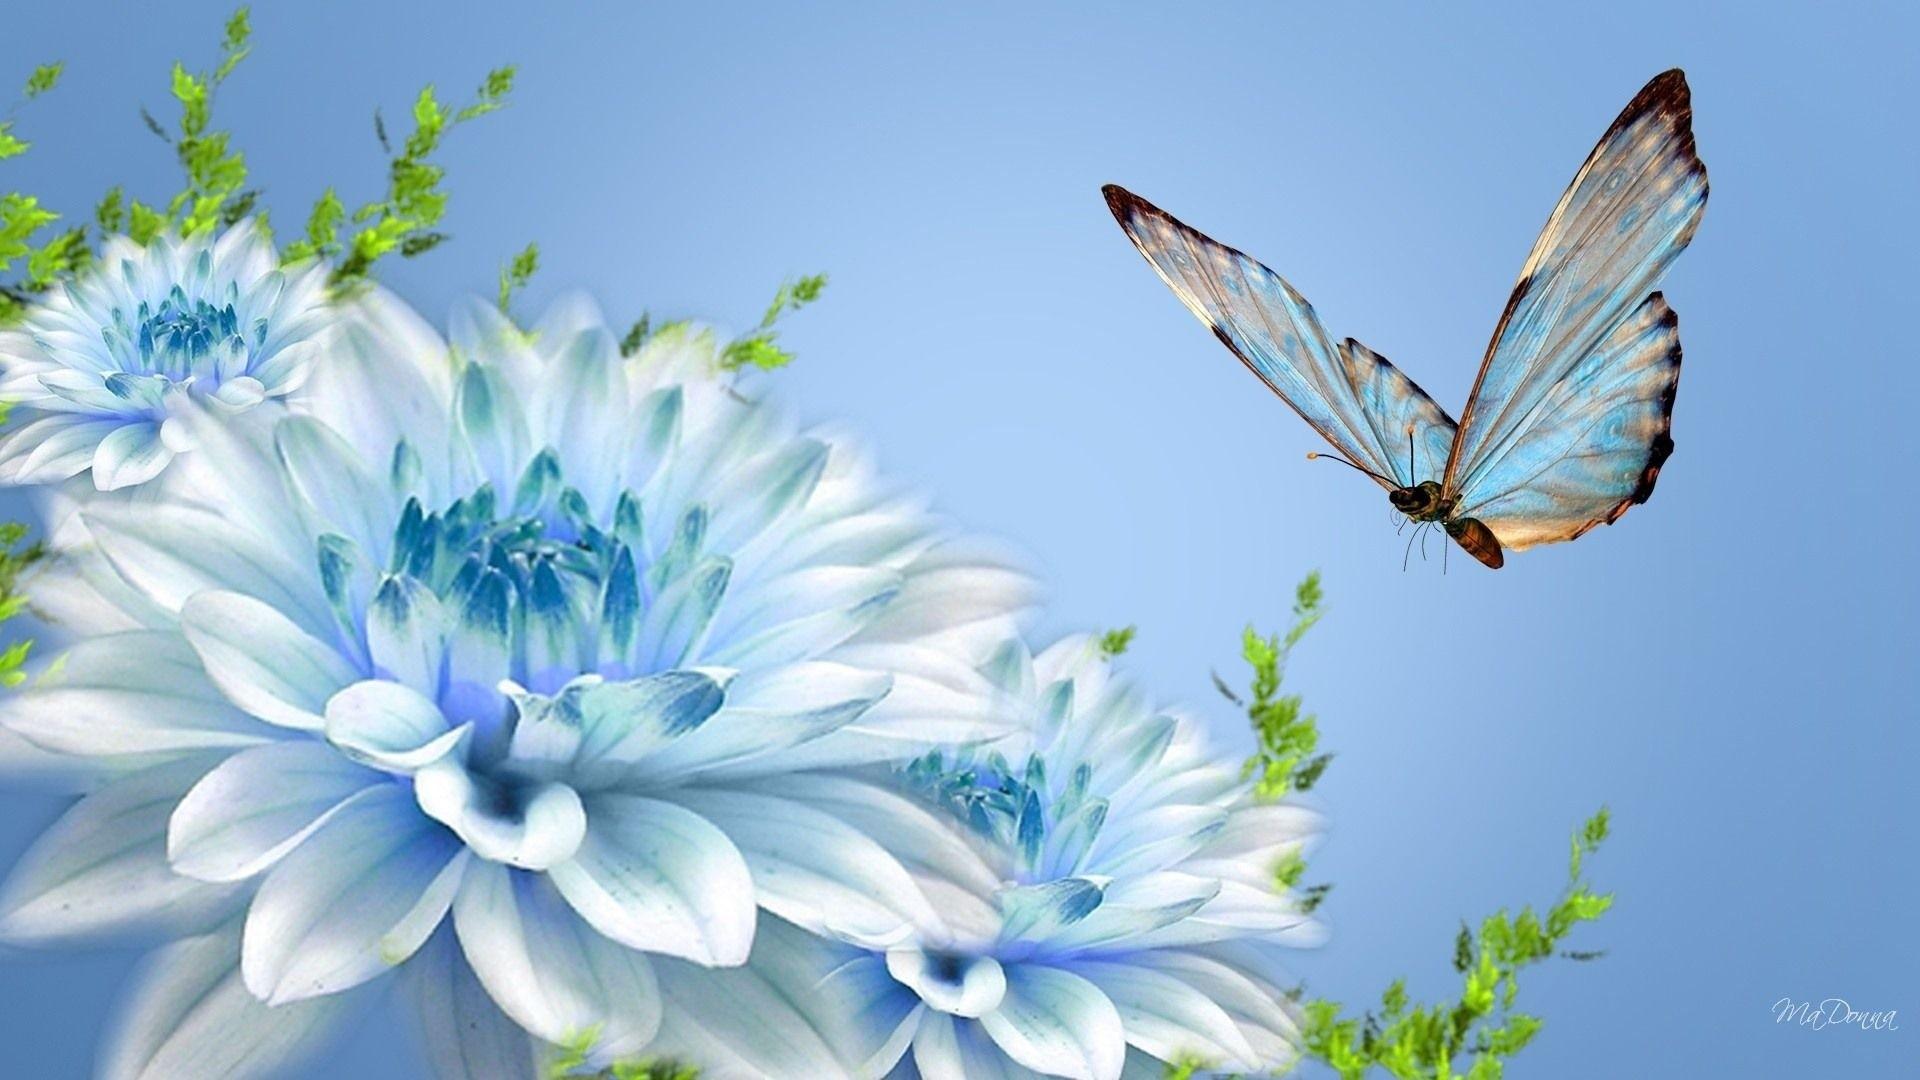 Wallpaper Flowers ·① WallpaperTag